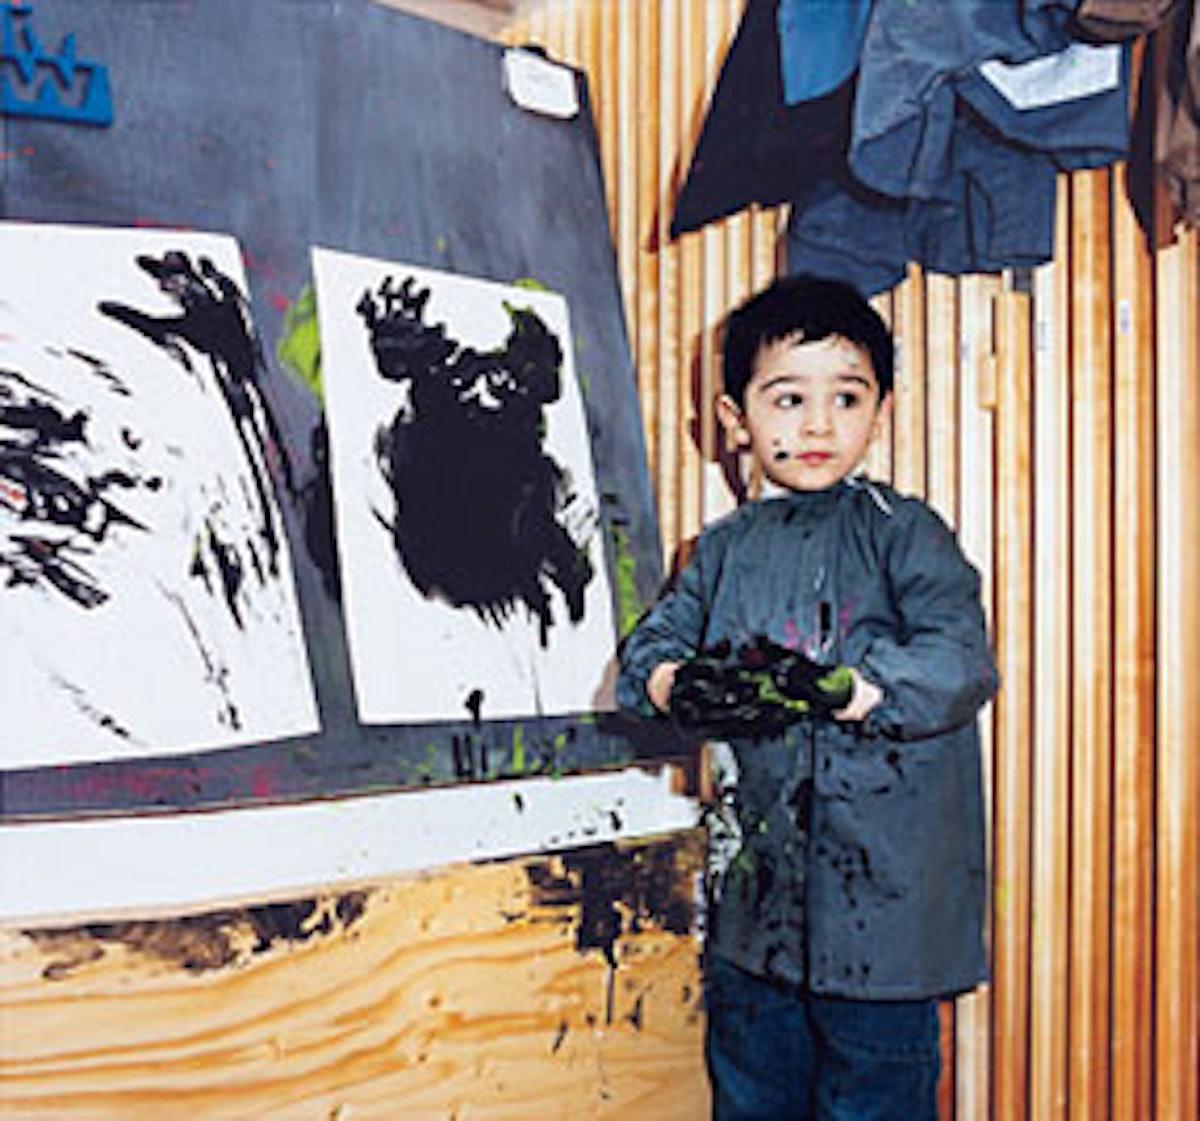 cear_preschool_02.jpg